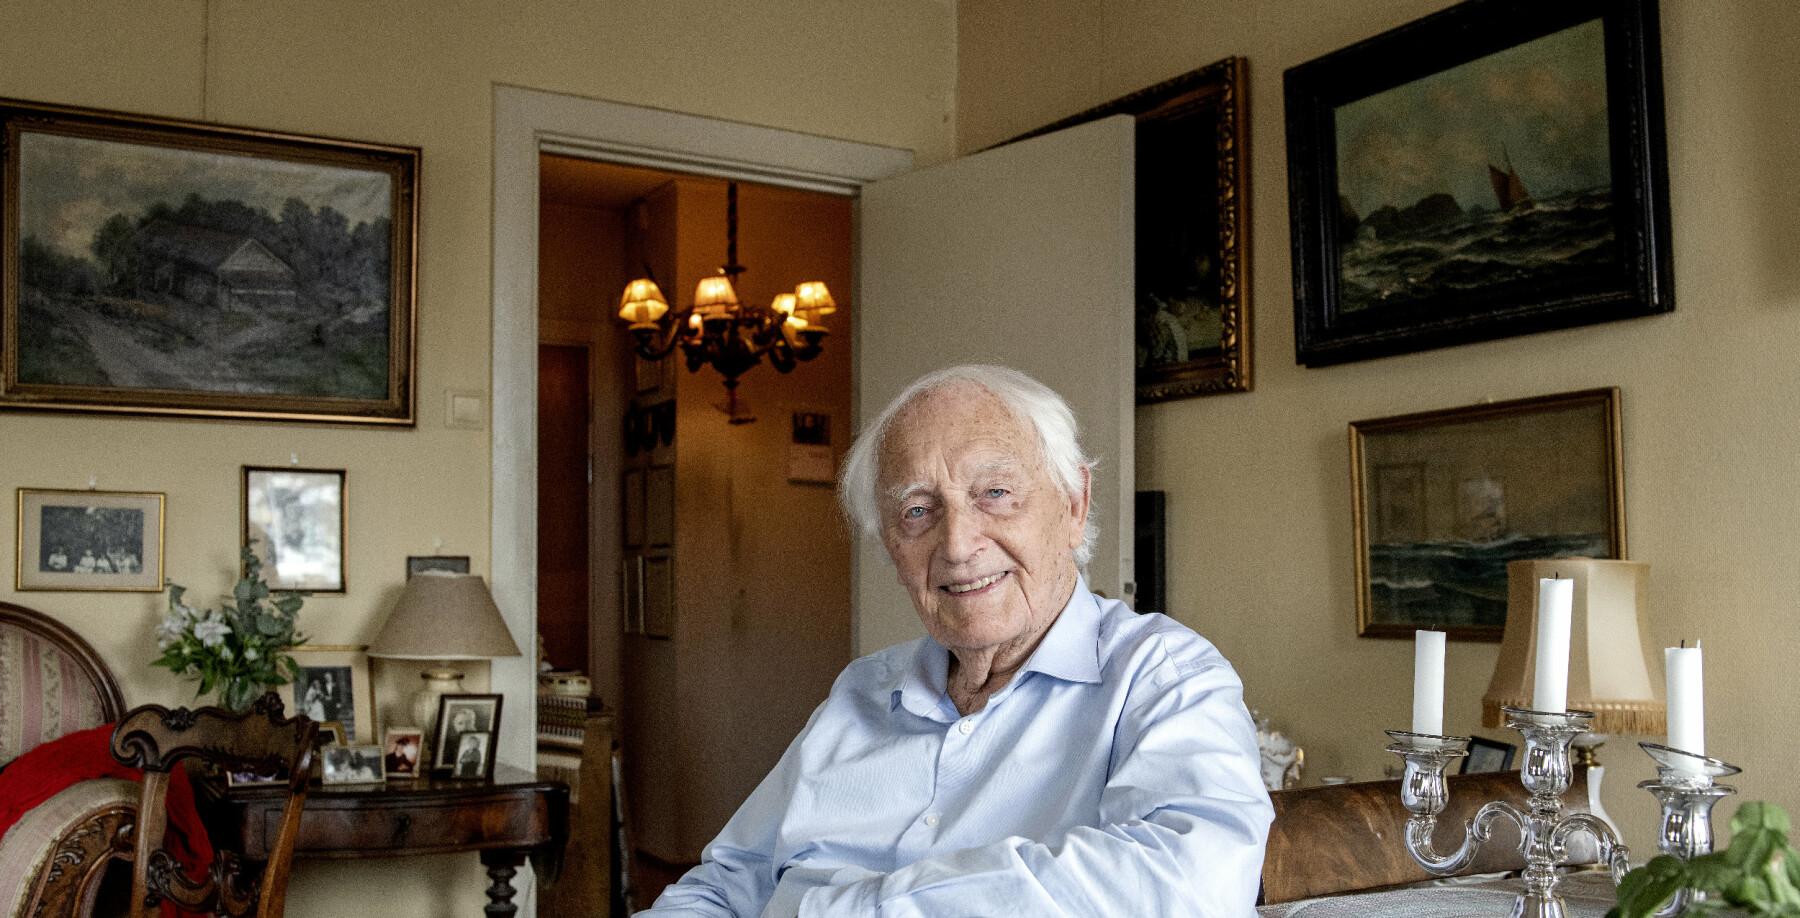 August Petro Theodor Olsen Rathke (født 11. desember 1925) er en norsk motstandsmann og politiker, aktiv i motstandsbevegelsen under andre verdenskrig. (Wikipedia)